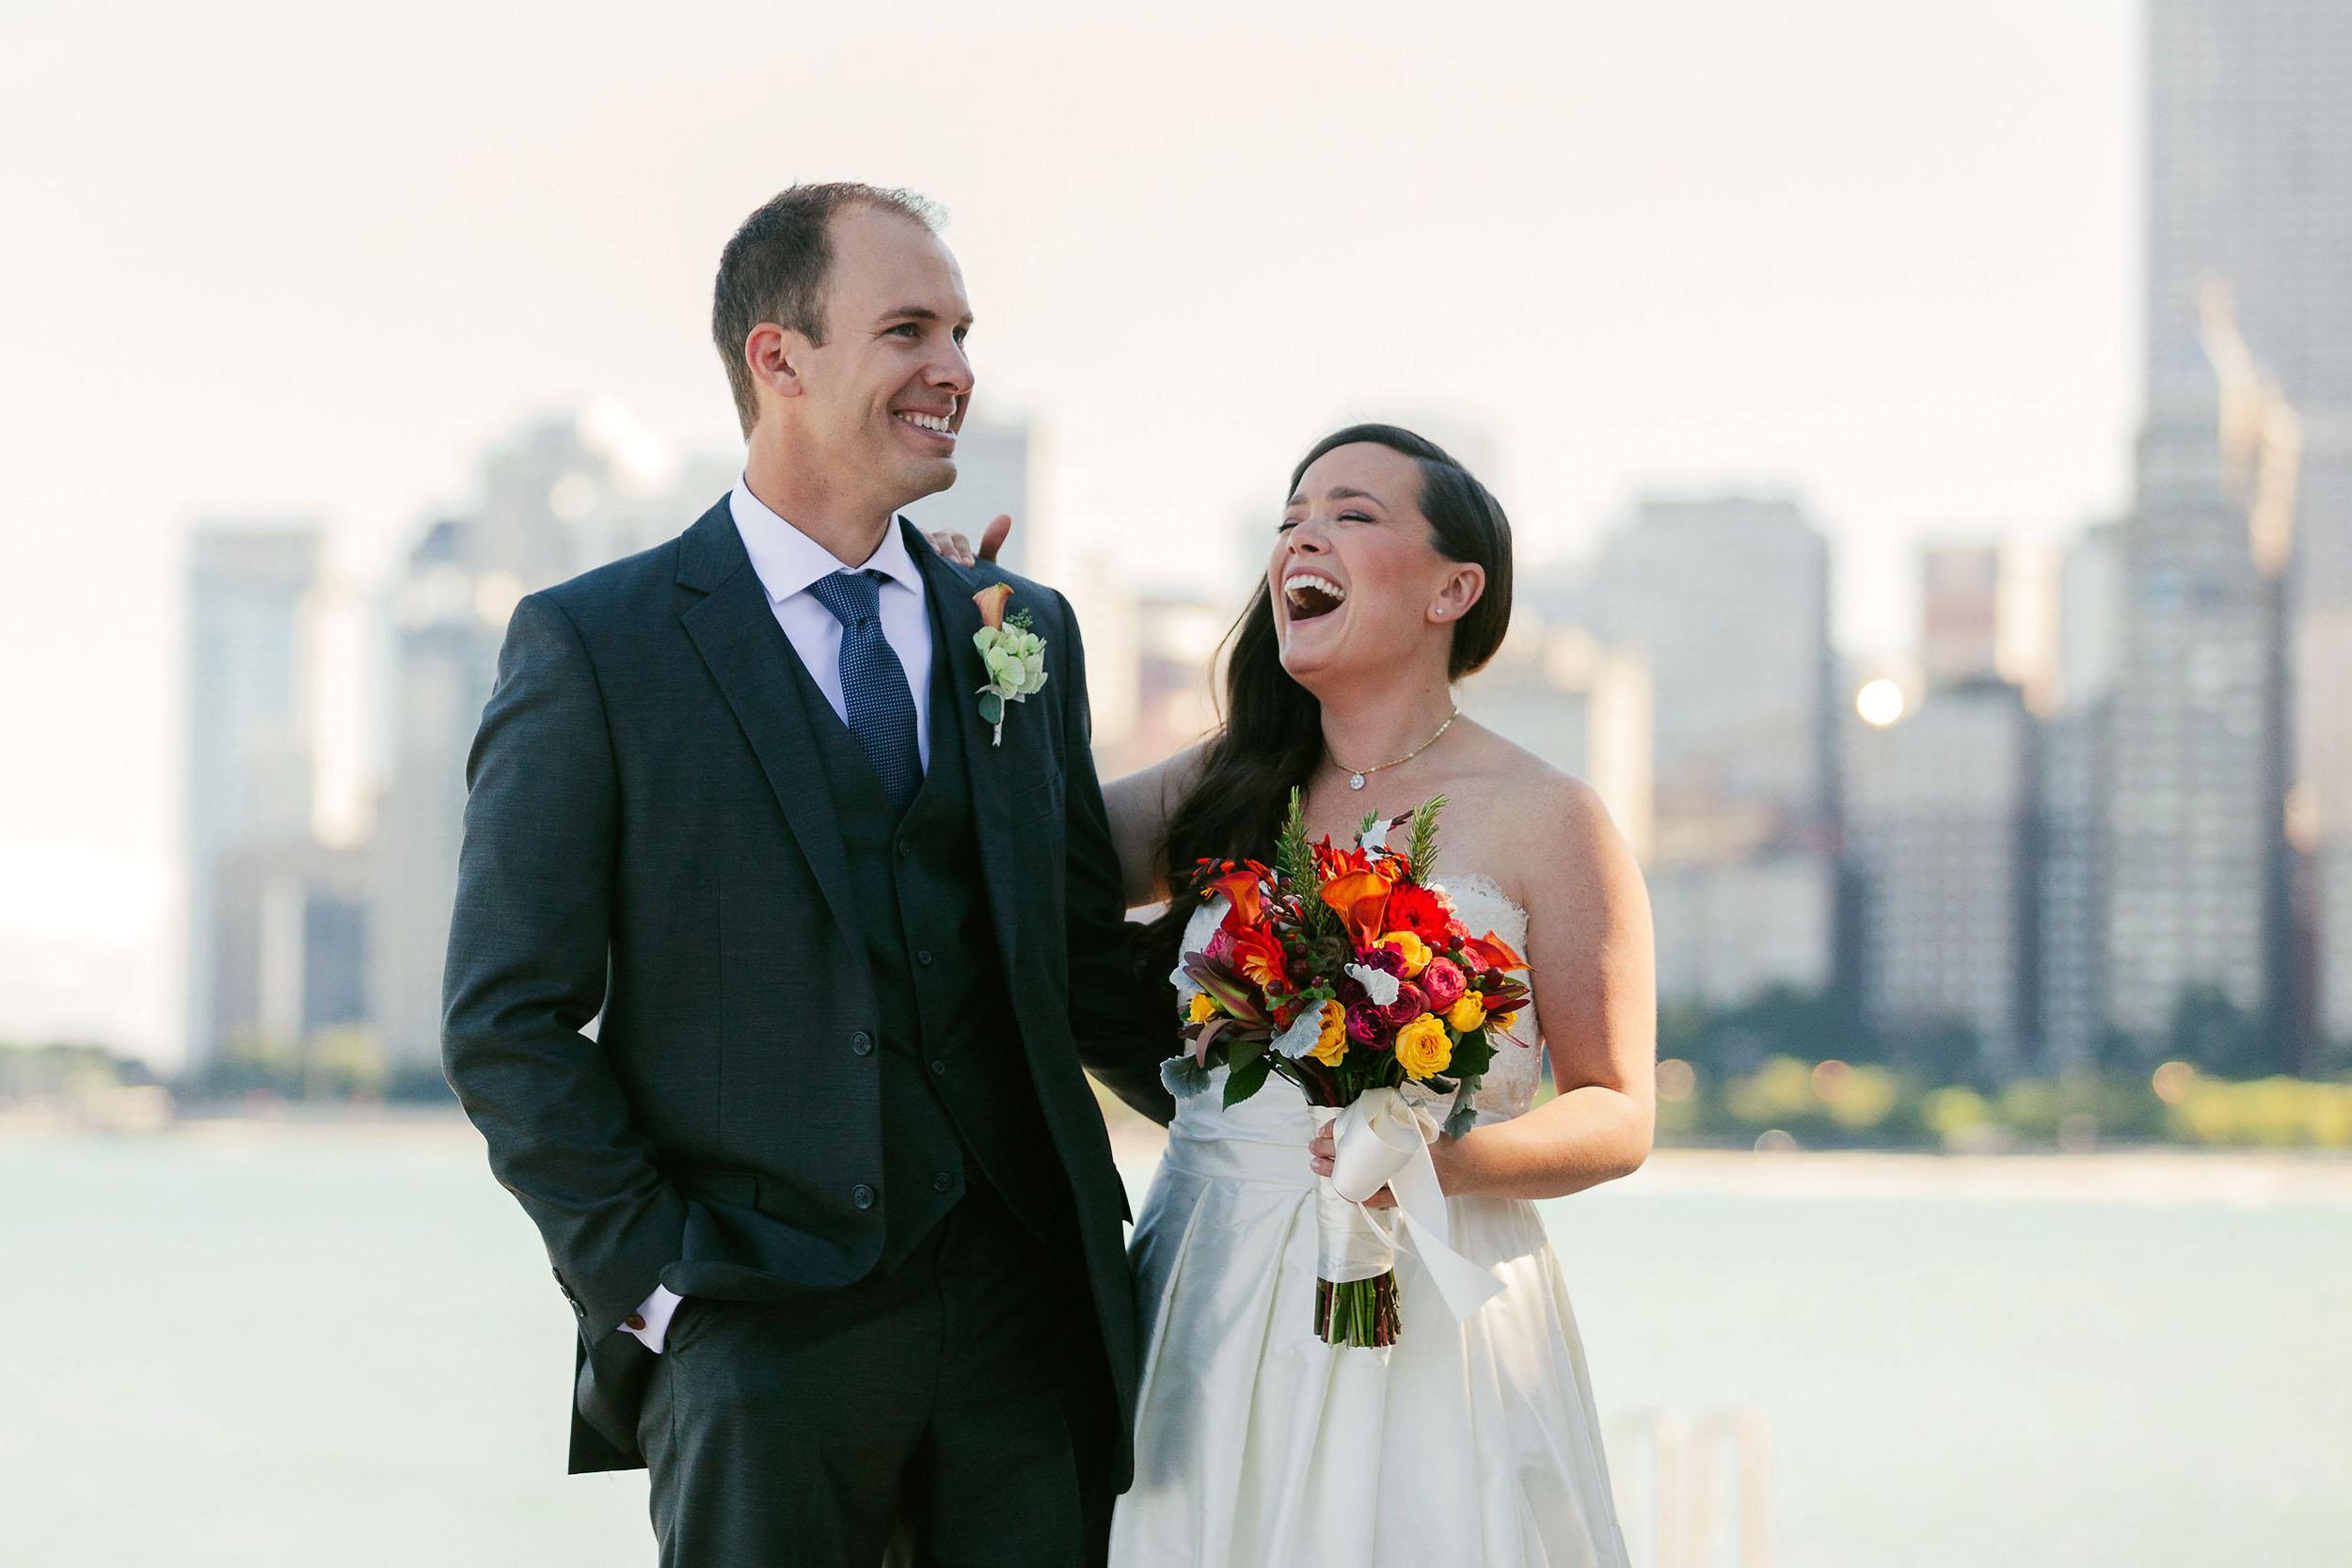 KarliCadel-Wedding-LaurenJake-352.jpg